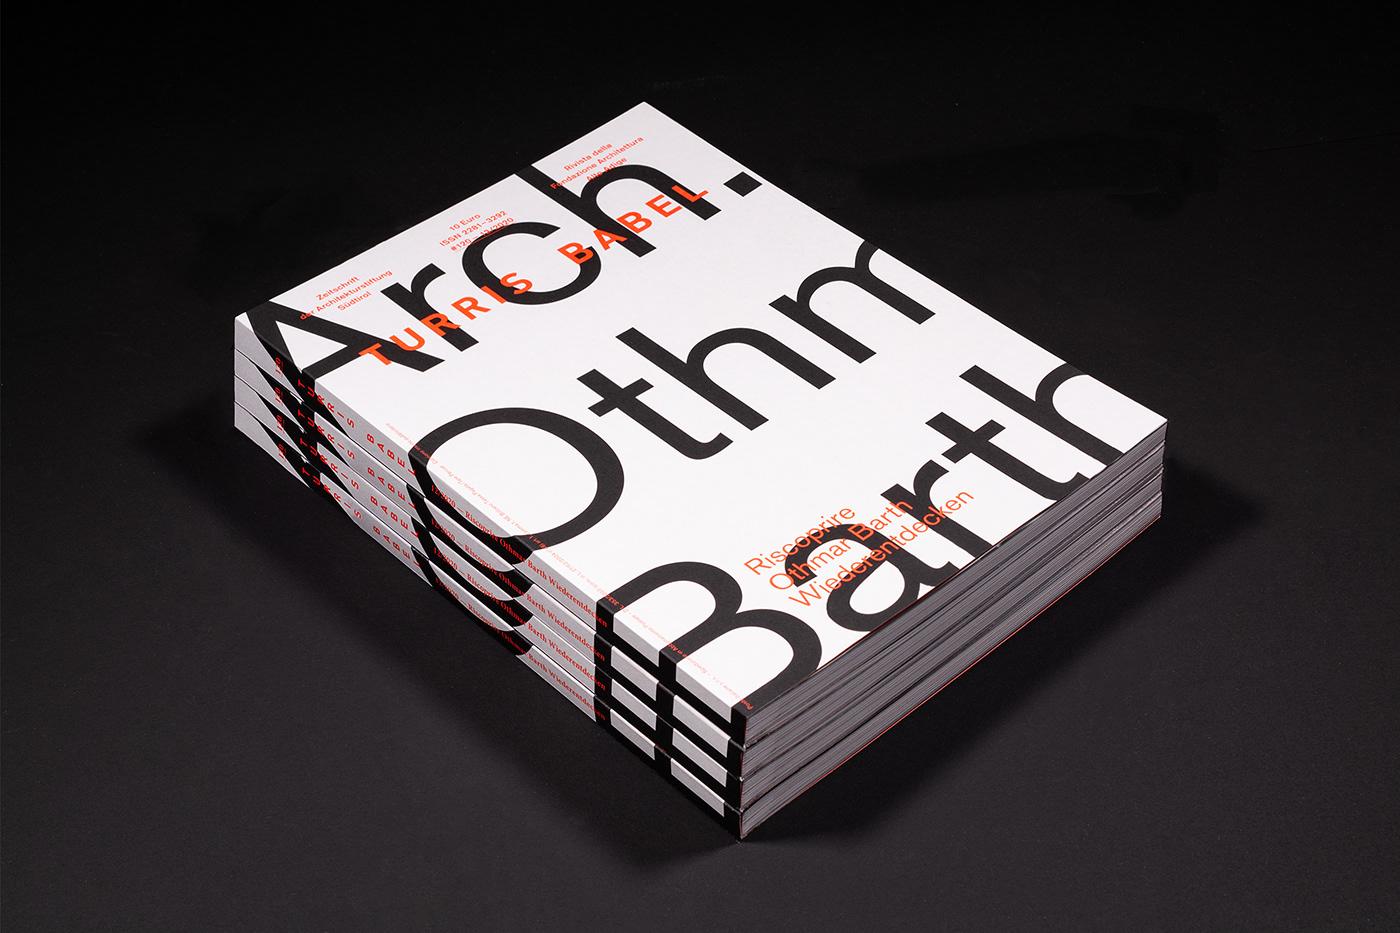 architecture design graphic design  Layout Megazine print typography